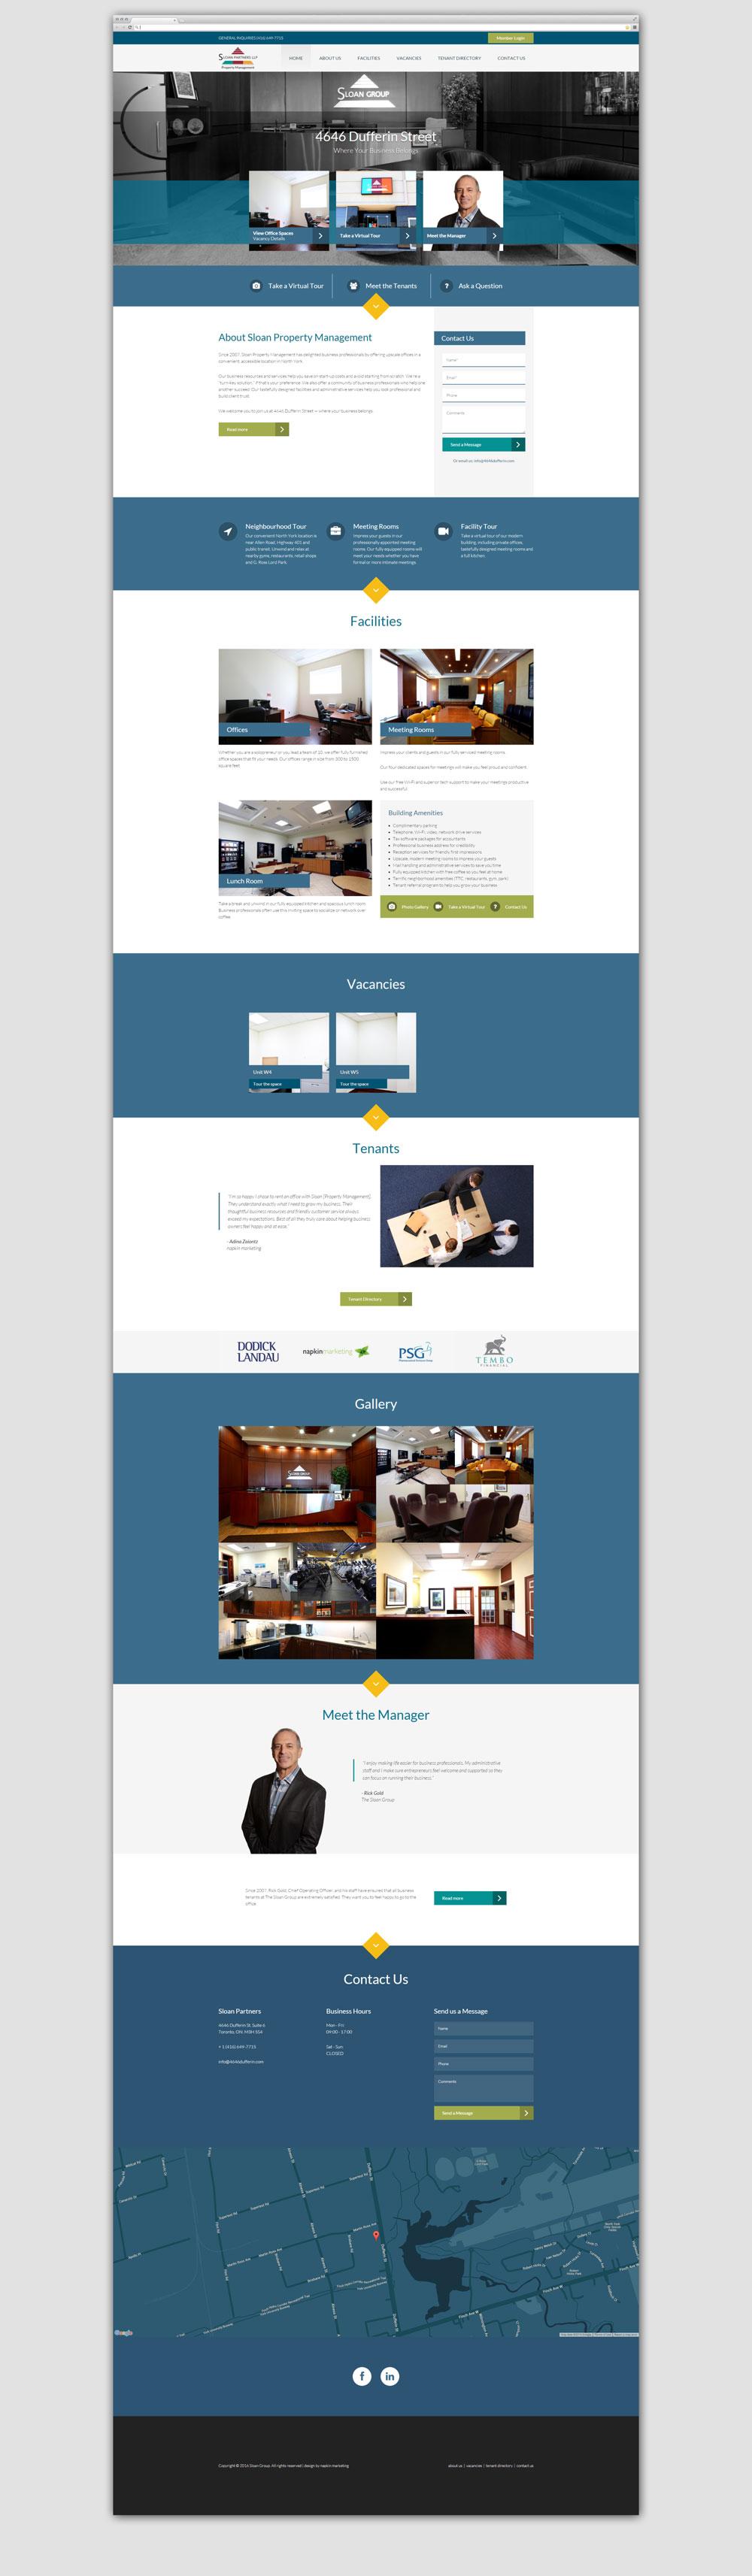 spm homepage